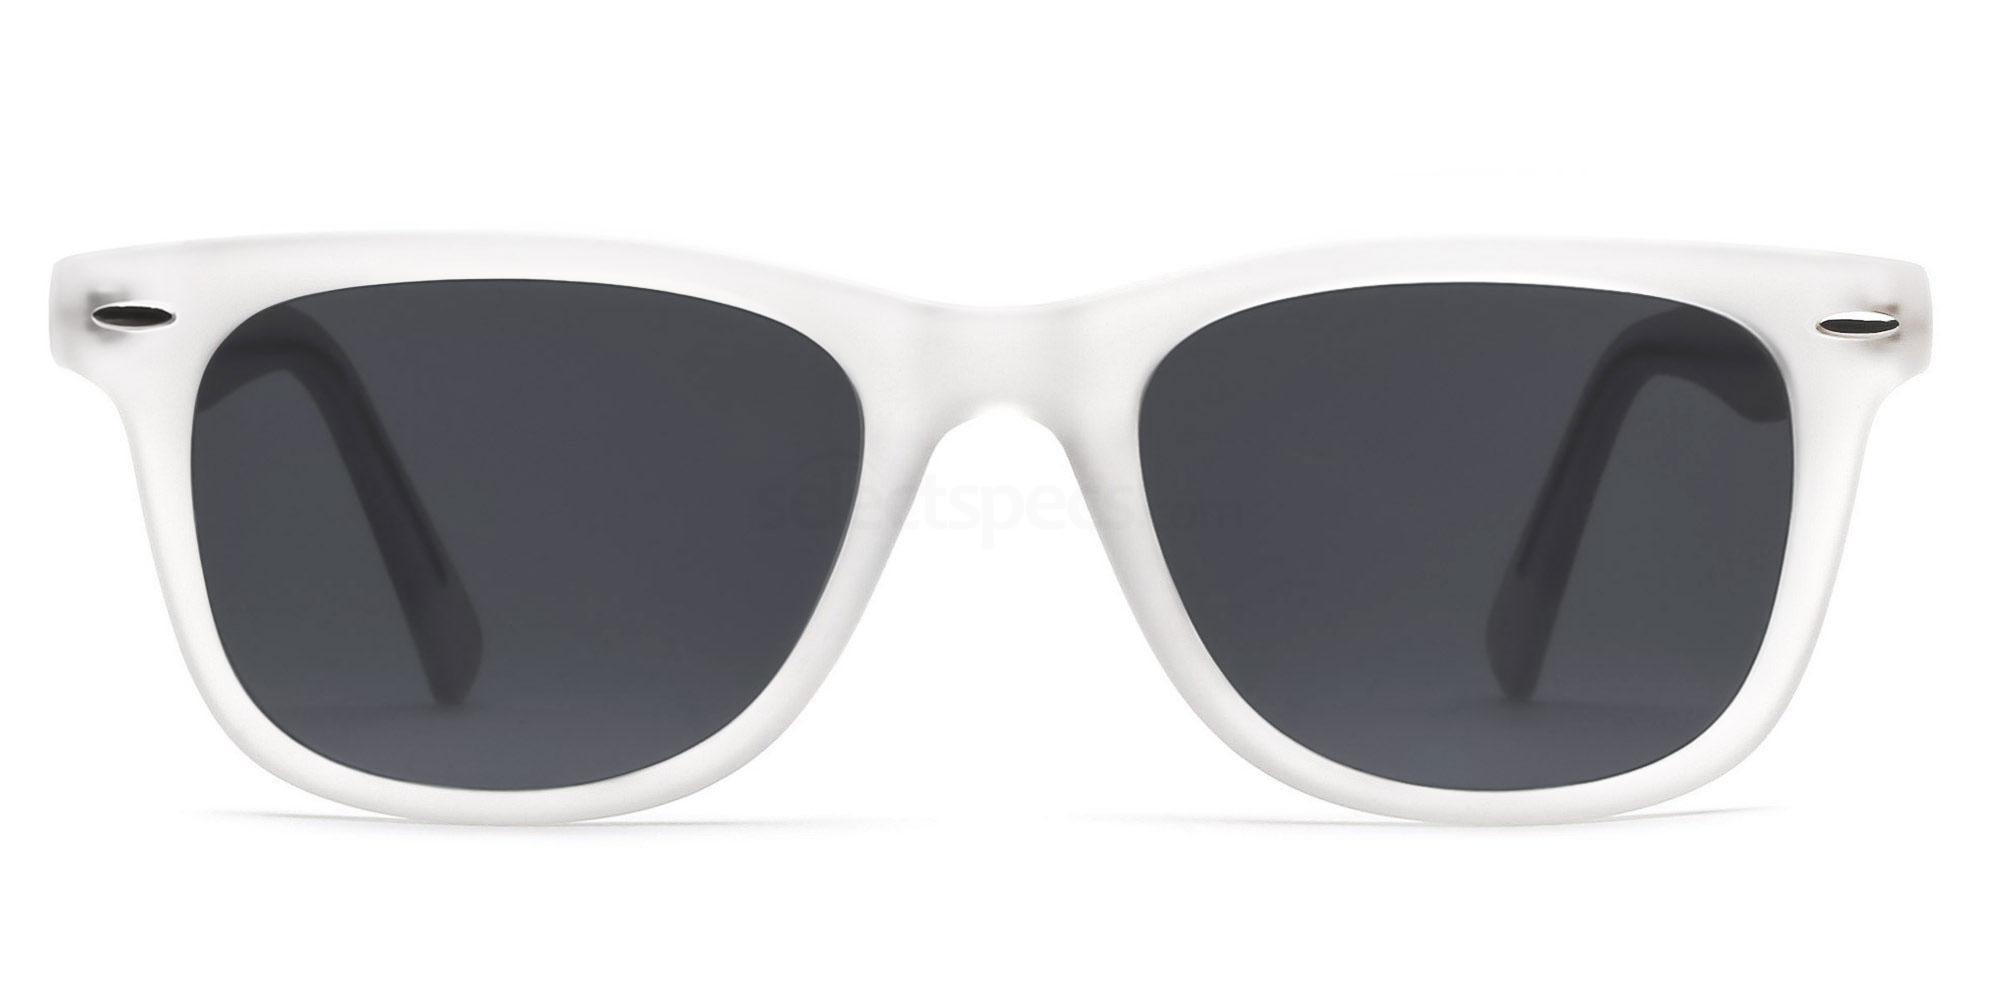 C10 8121 - Clear (Sunglasses) Sunglasses, Savannah